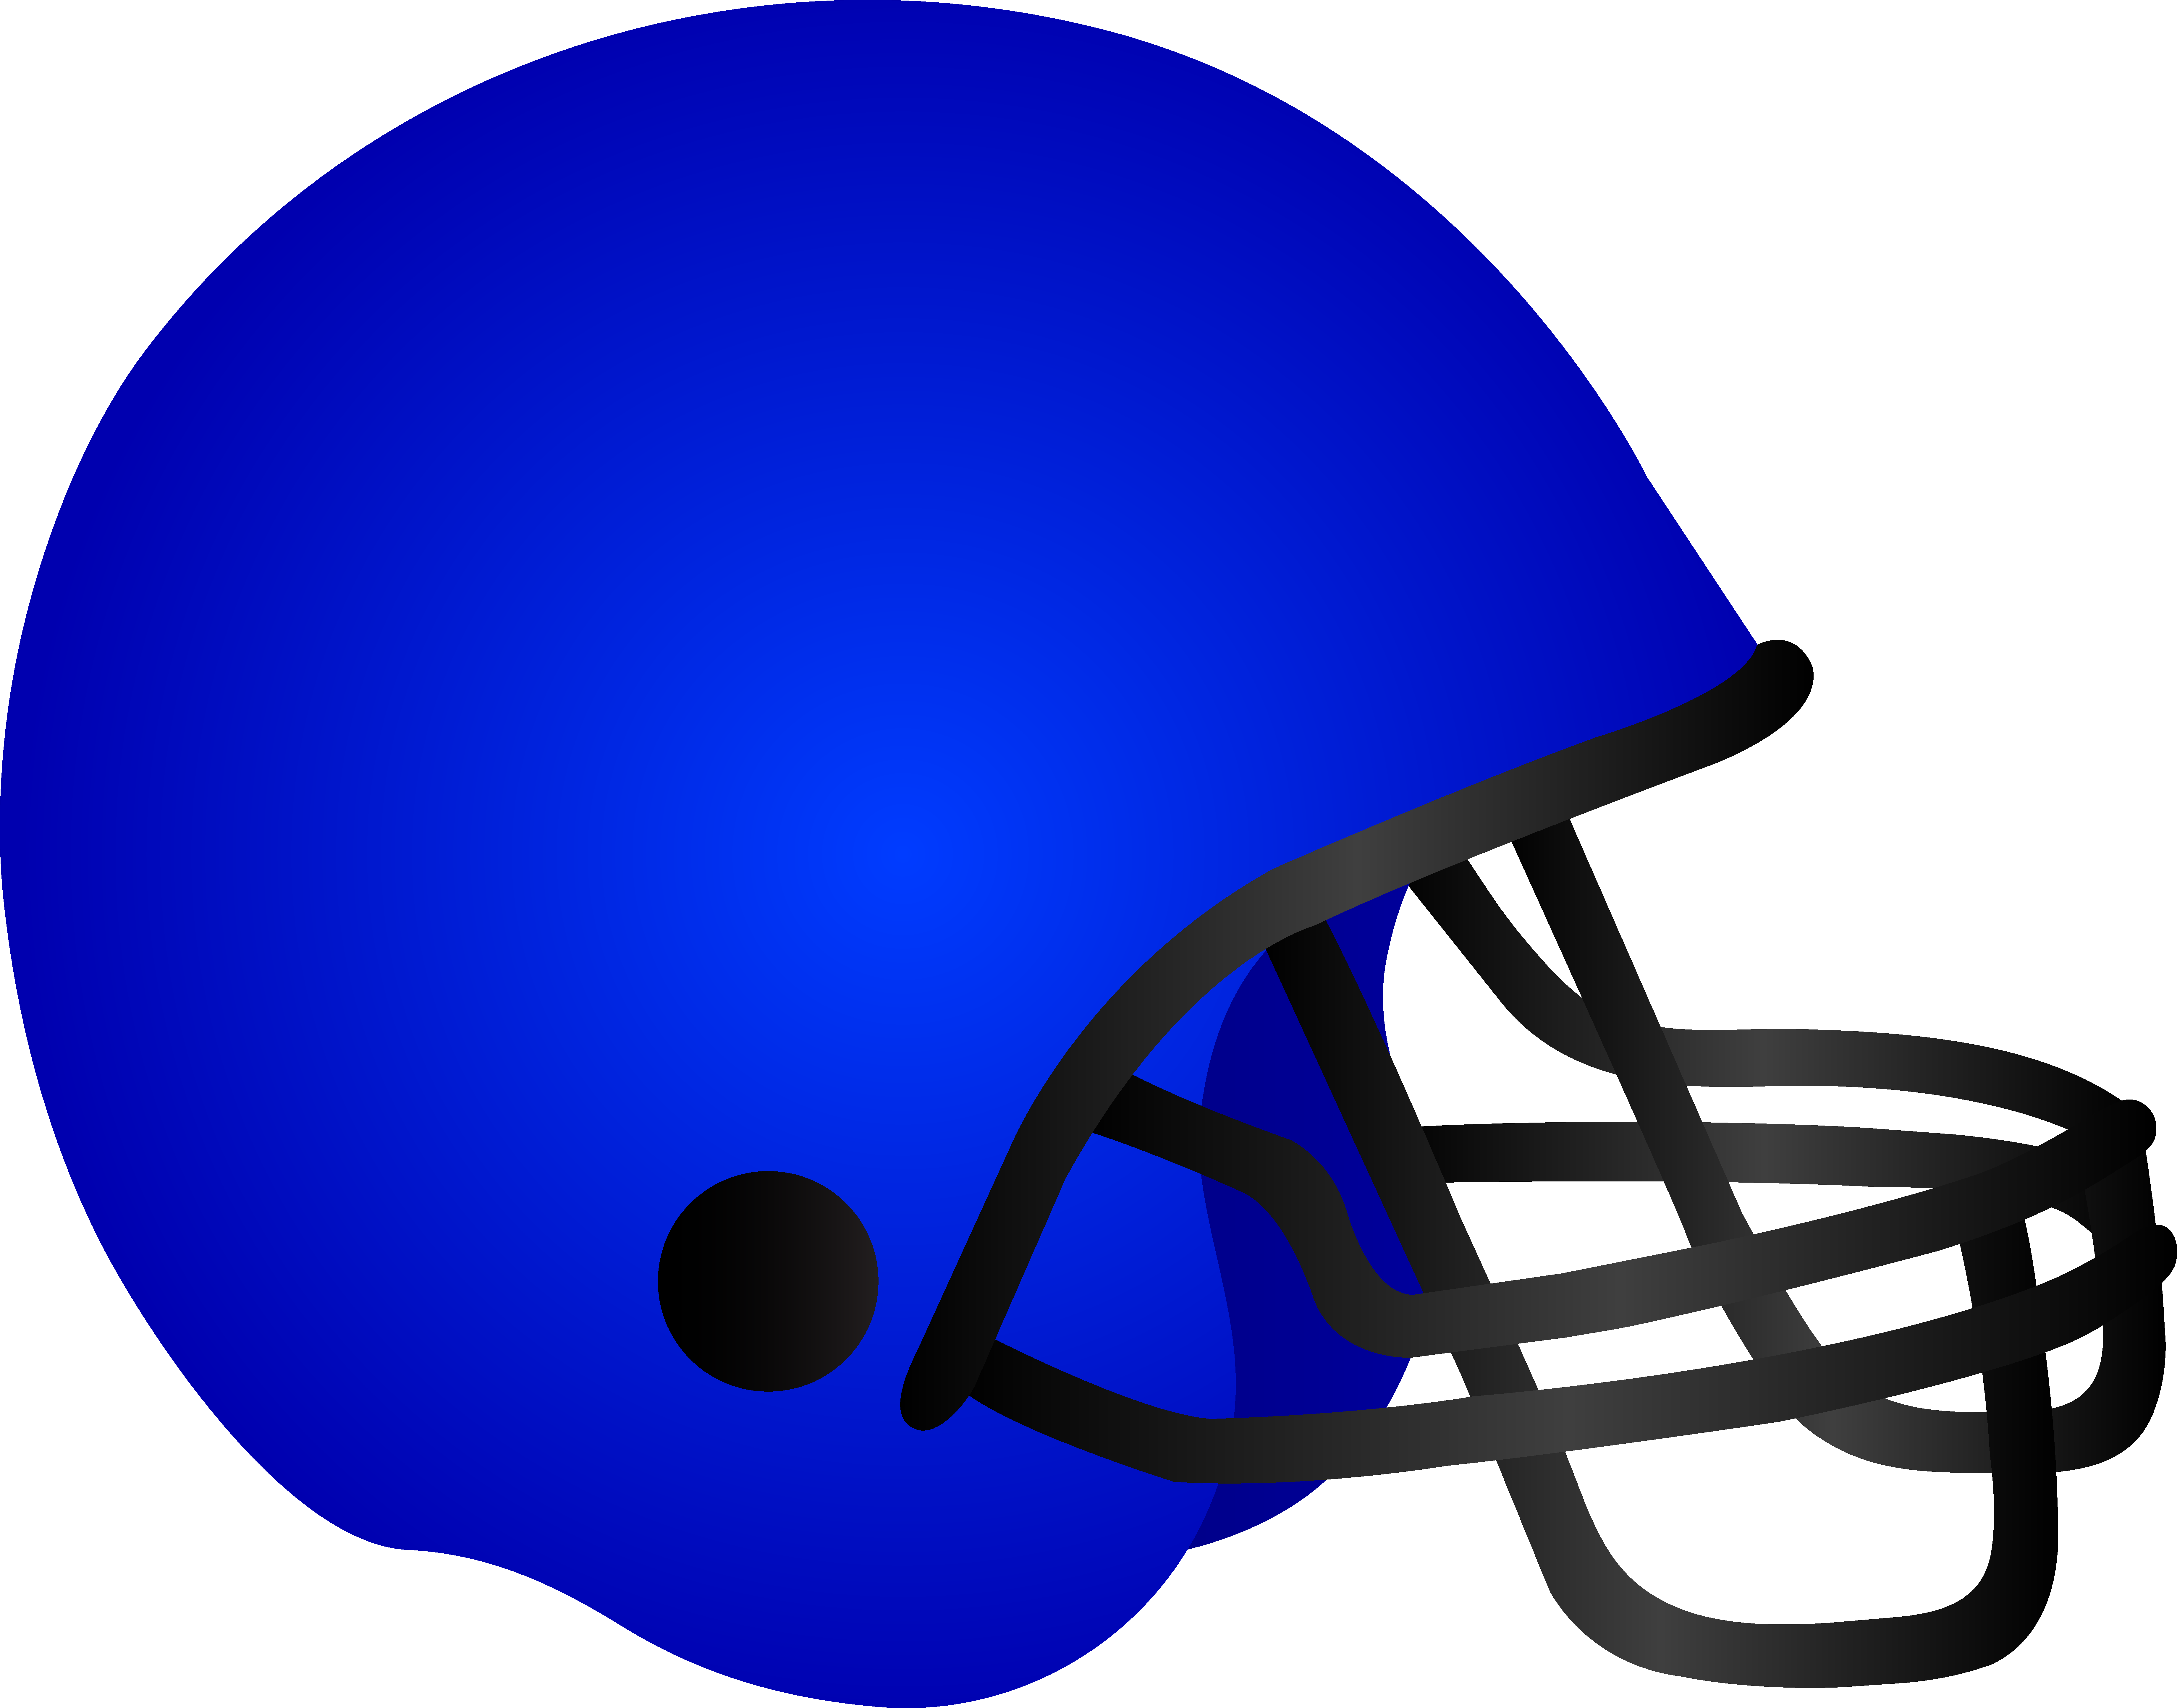 Blue helmet clipart clip library stock Blue Football Helmet - Free Clip Art clip library stock